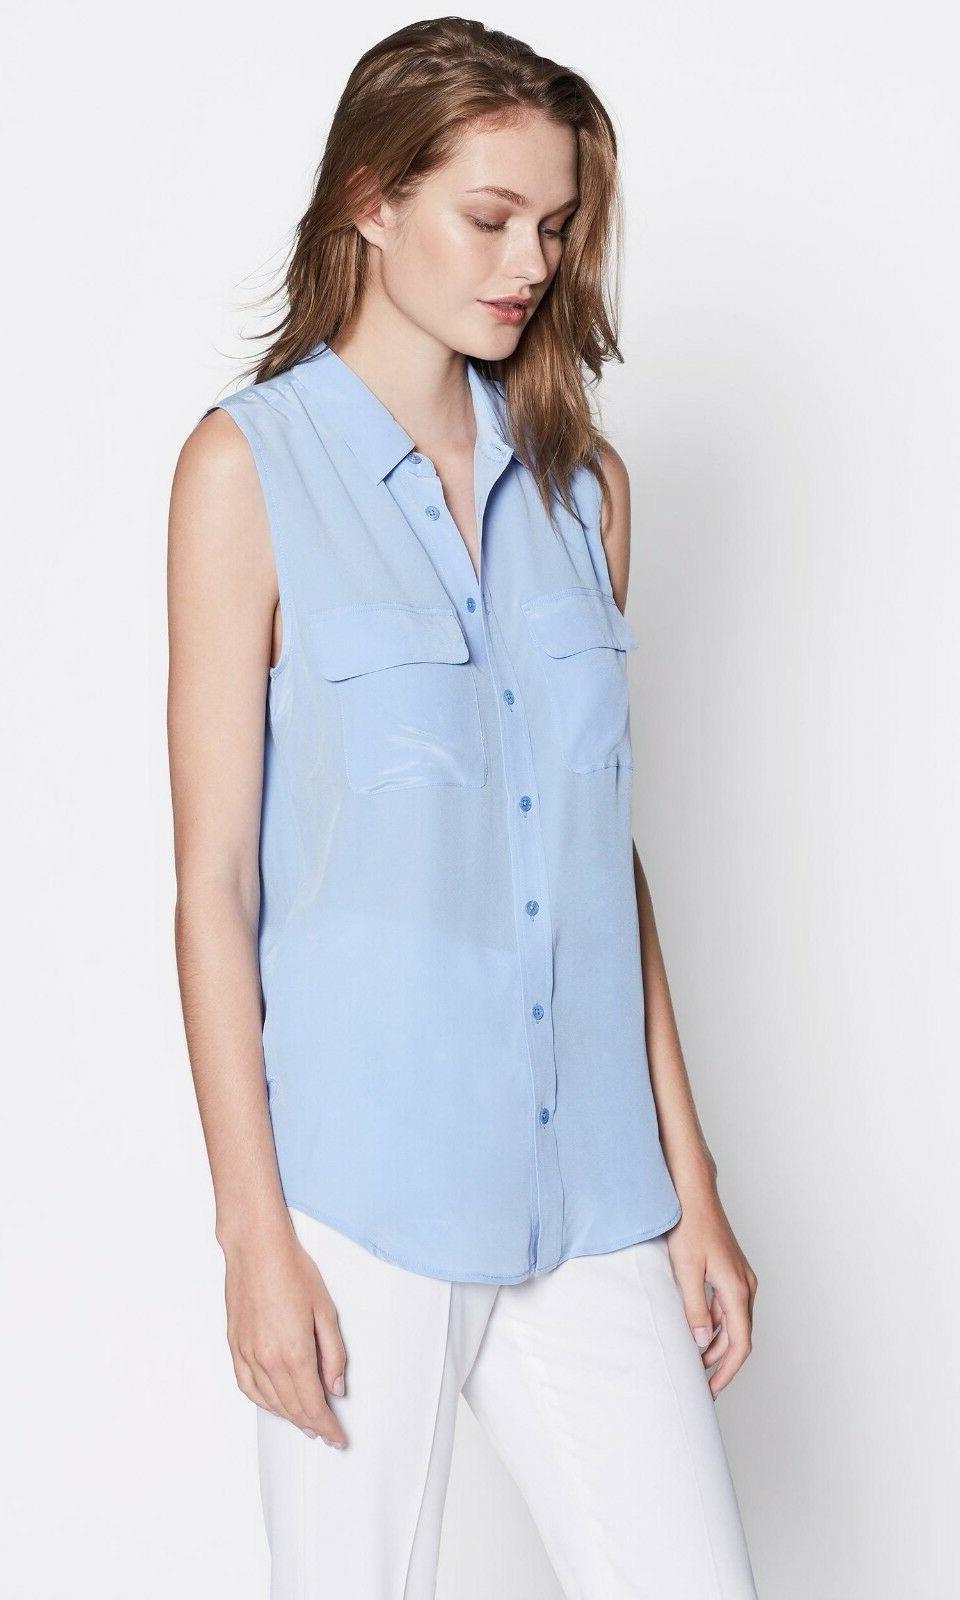 NWT Signature Shirt, Blue S, M $198